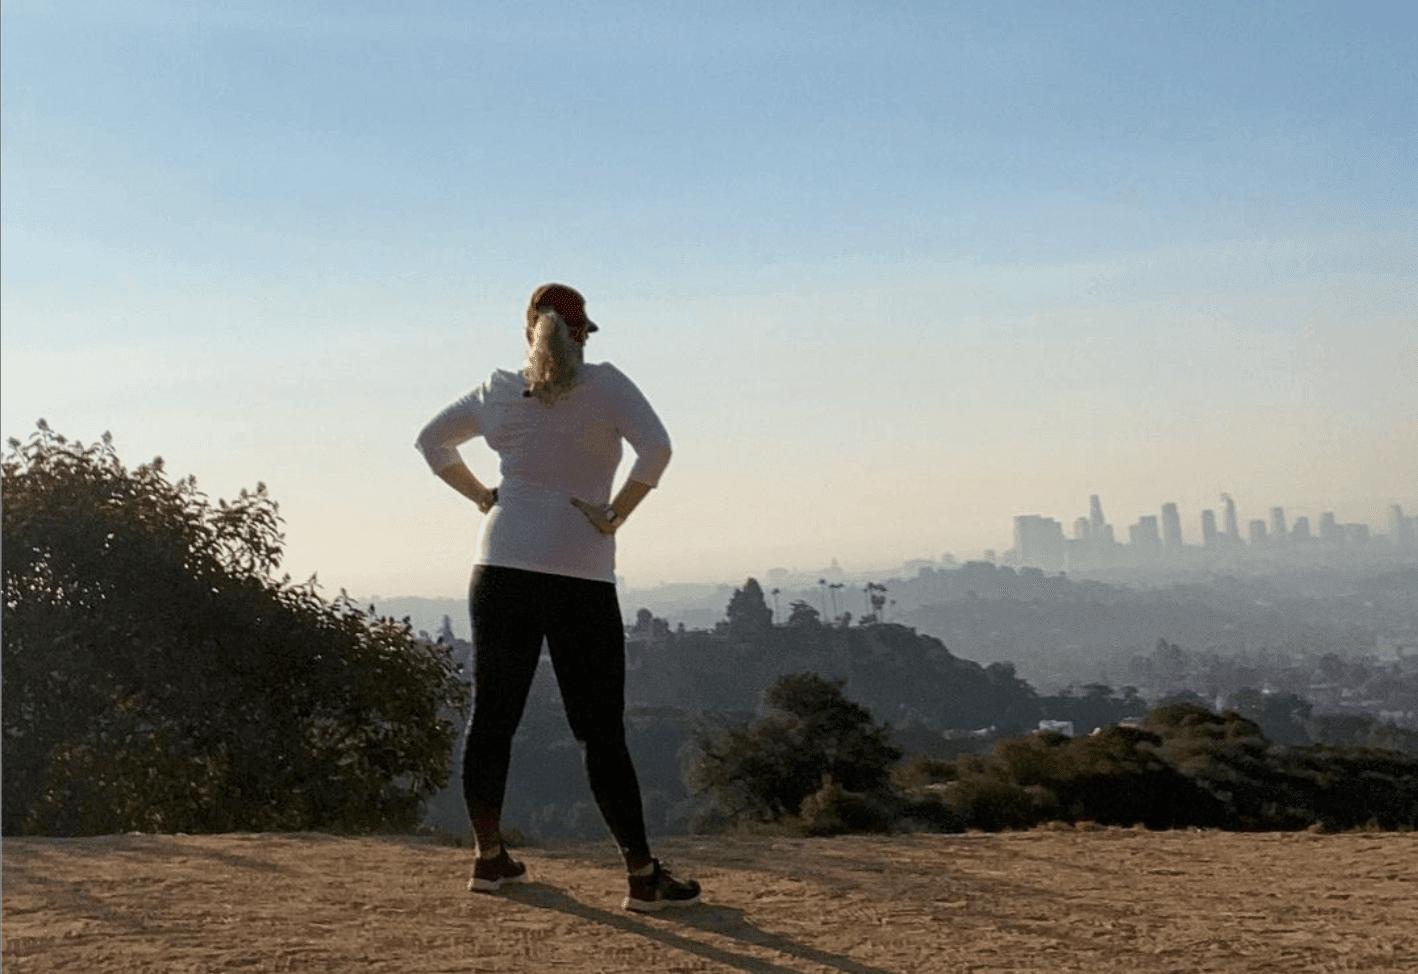 Rebel standing on mountain